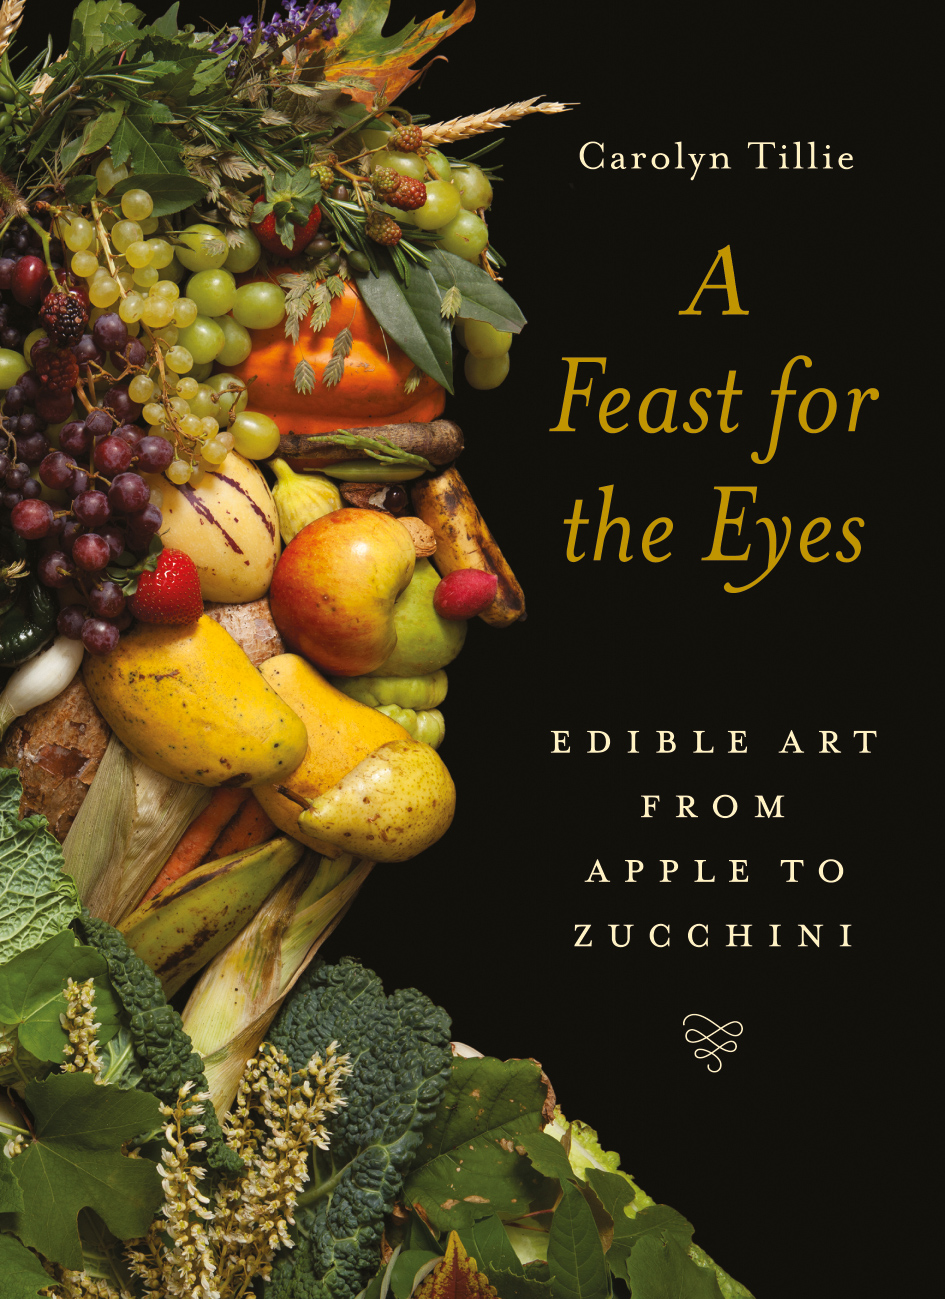 Feast for the Eyes.jpg